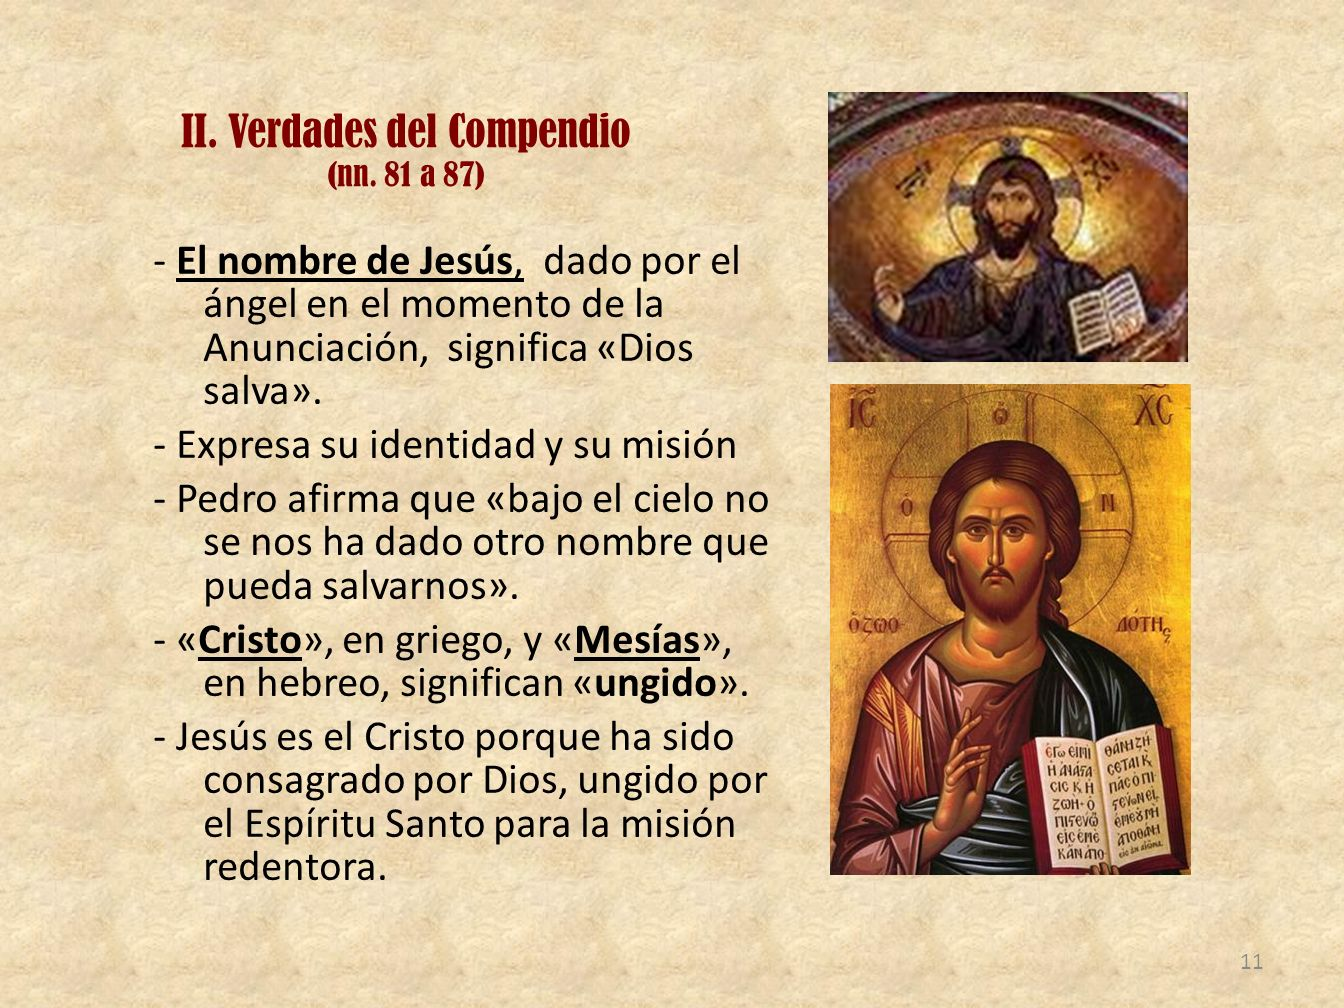 II. Verdades del Compendio (nn. 81 a 87)